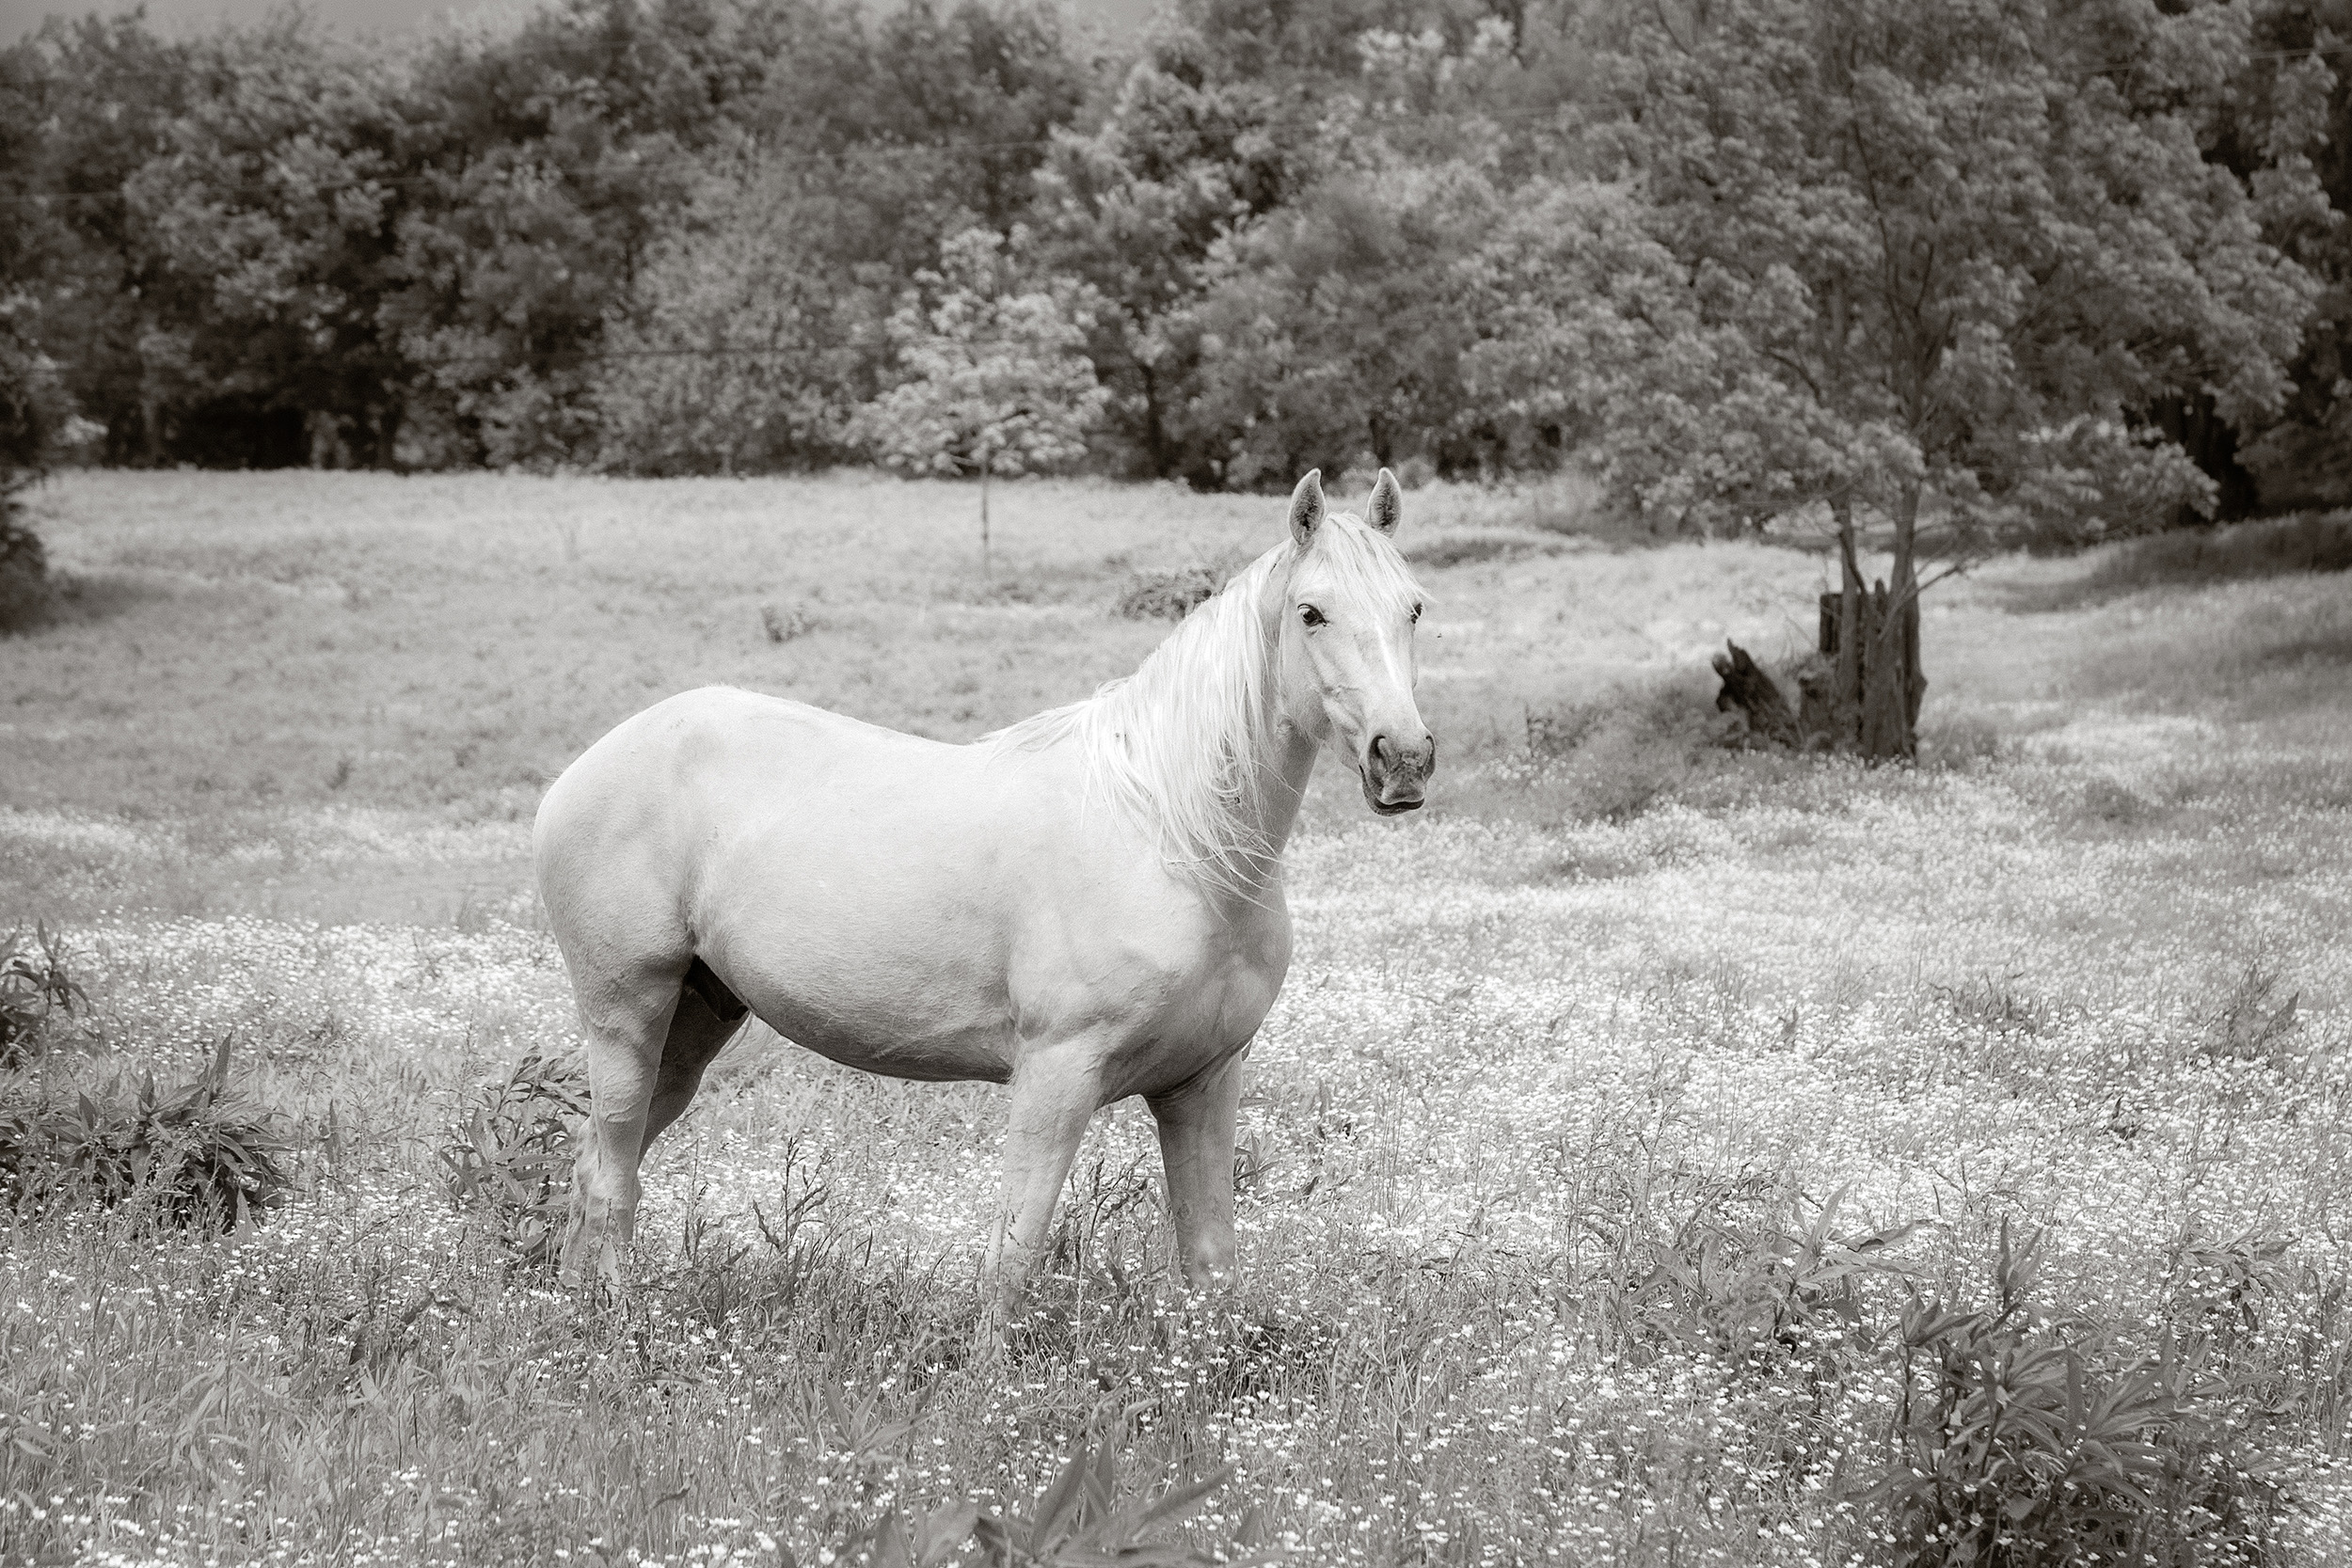 RSmith_Horse_3233BWInf_2500.jpg